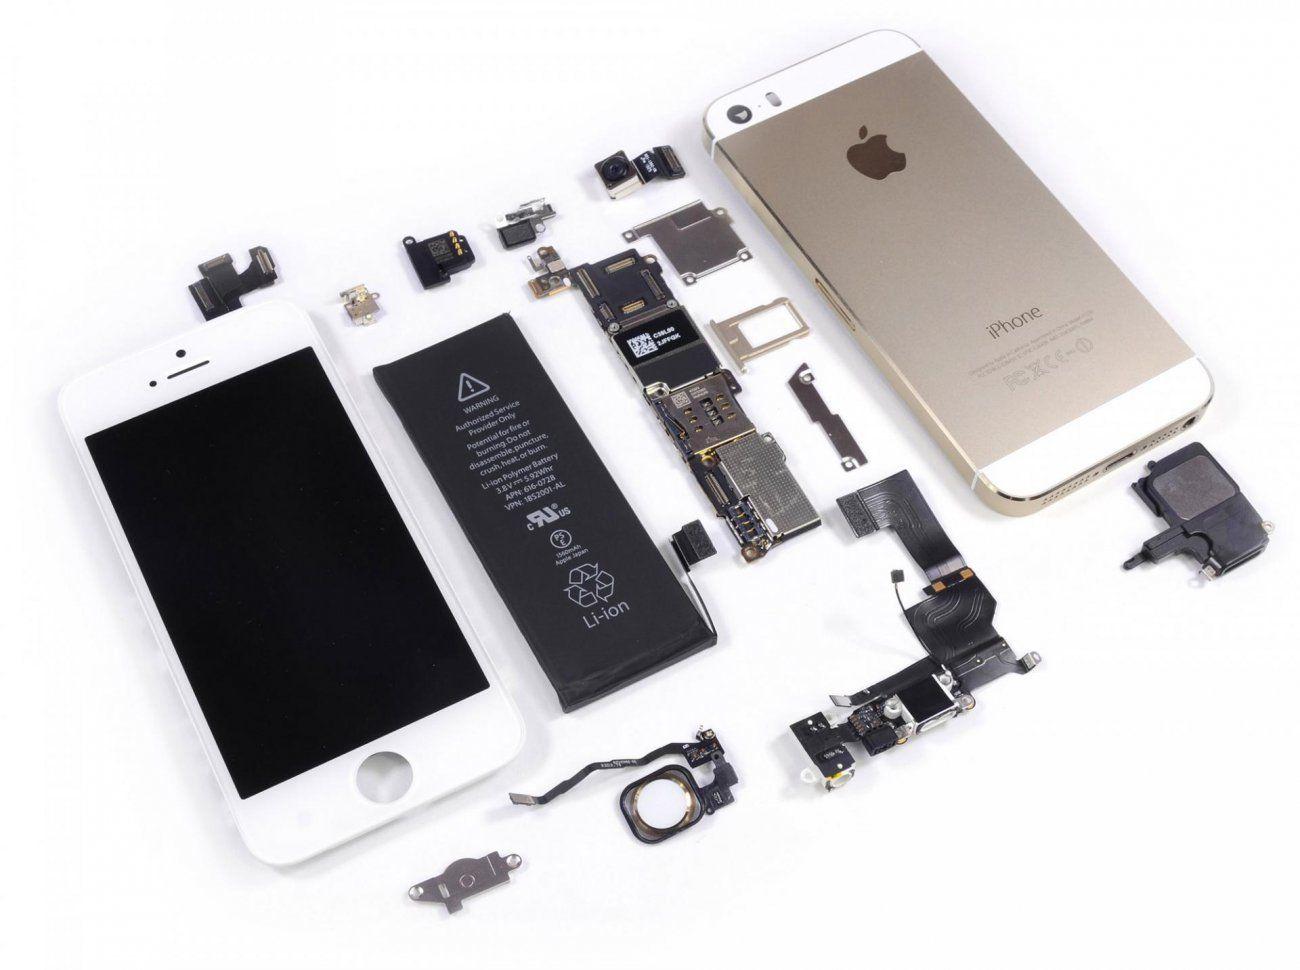 Ремонт iPhone 5/5s в Краснодаре-FastFixService23.ru